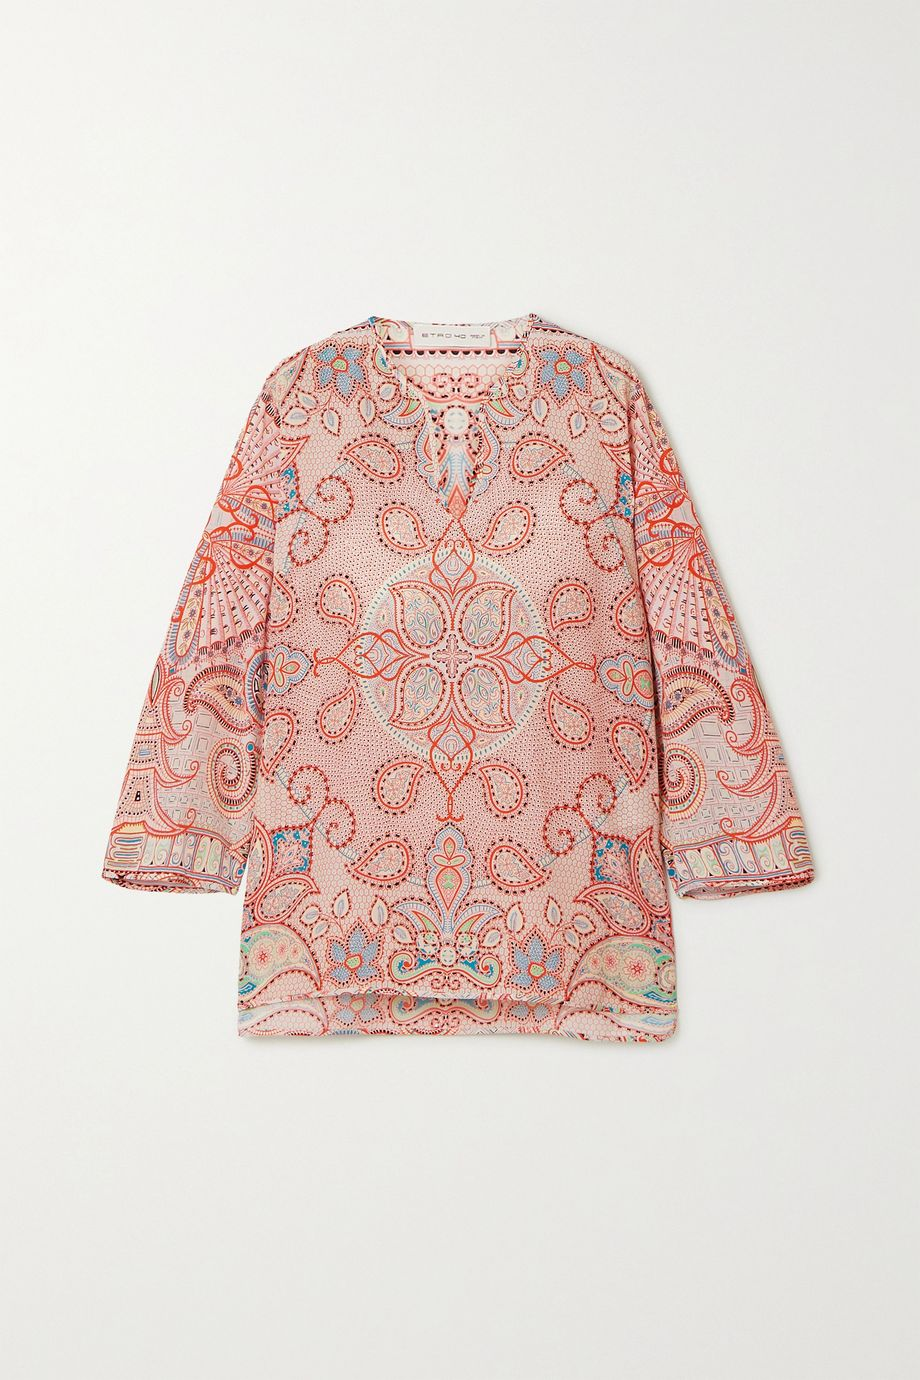 Etro Paisley-print silk top